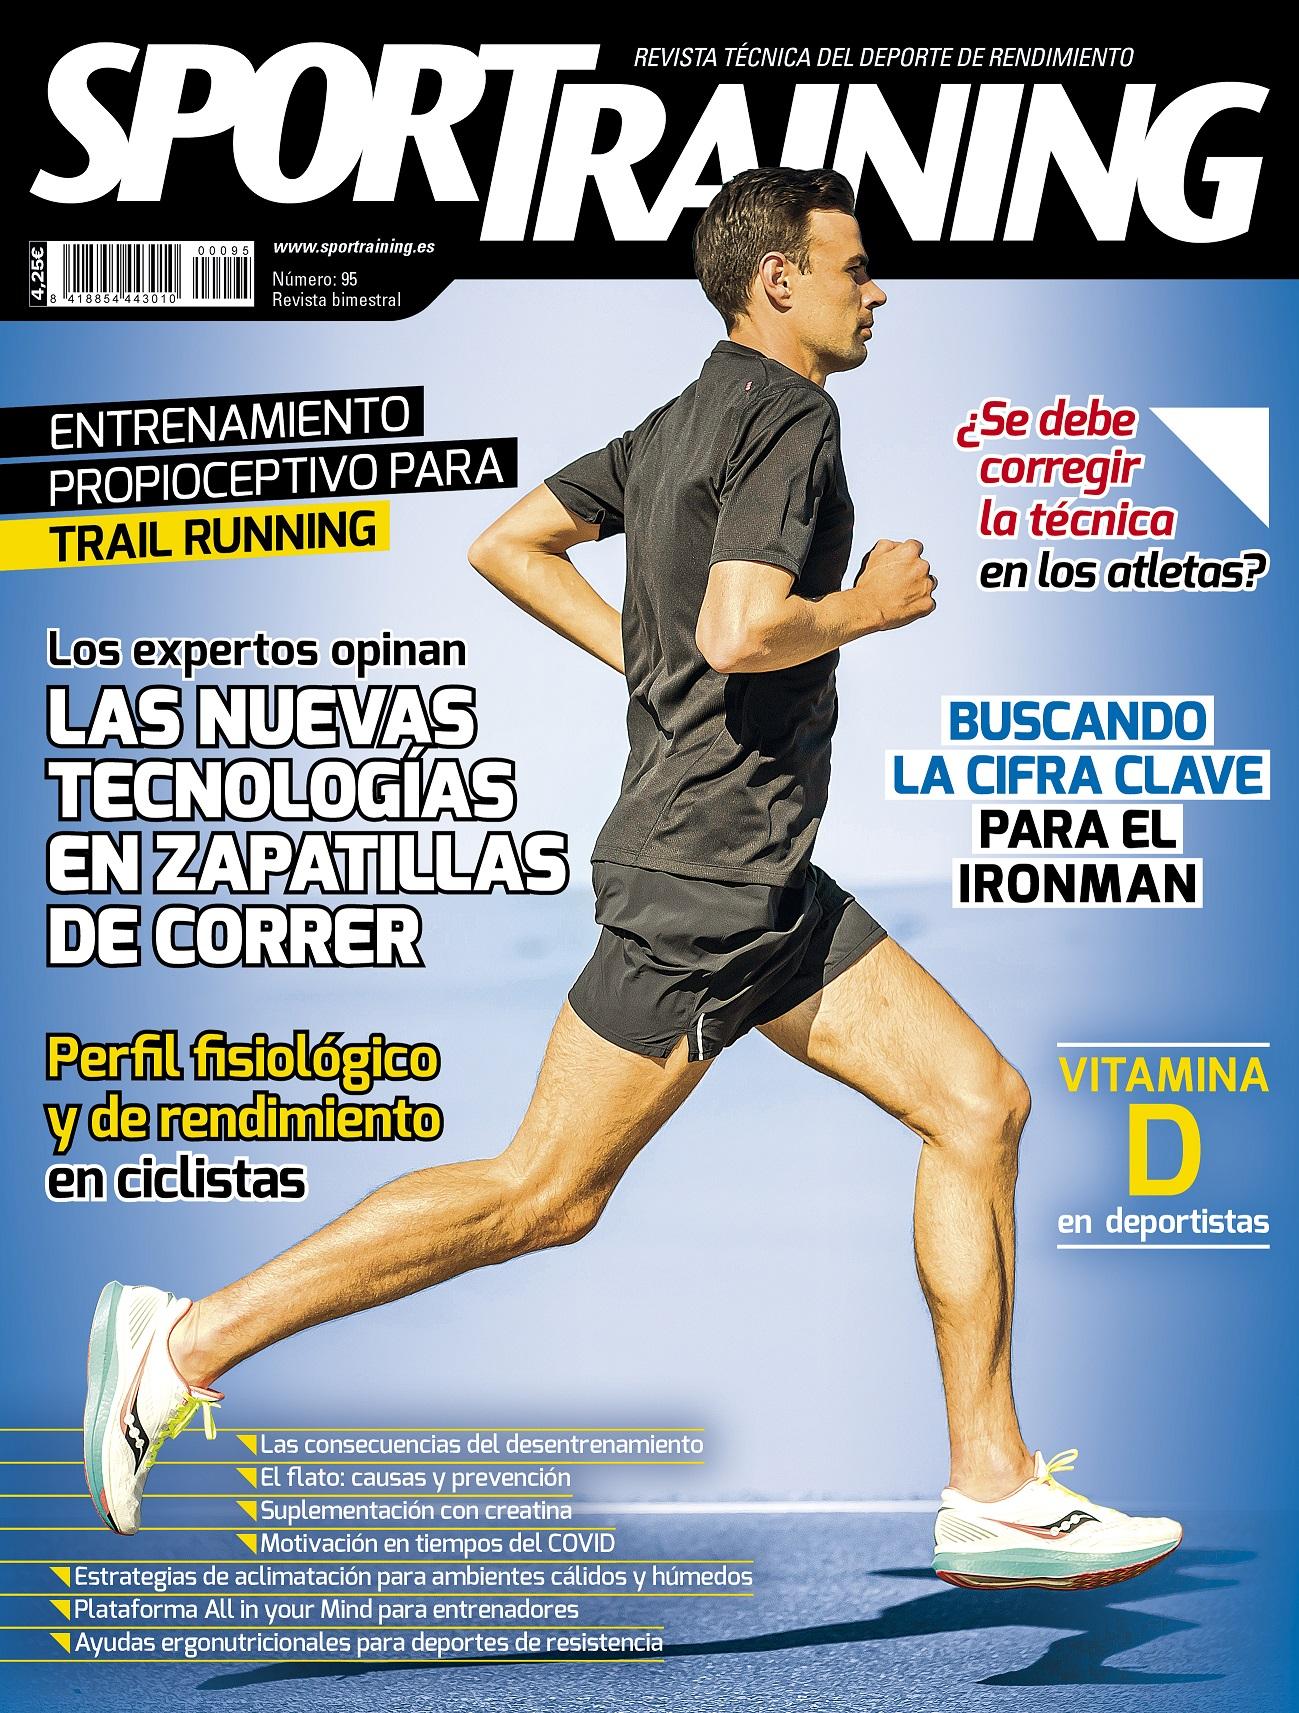 Sportraining nº 95 (marzo/abril 2021)